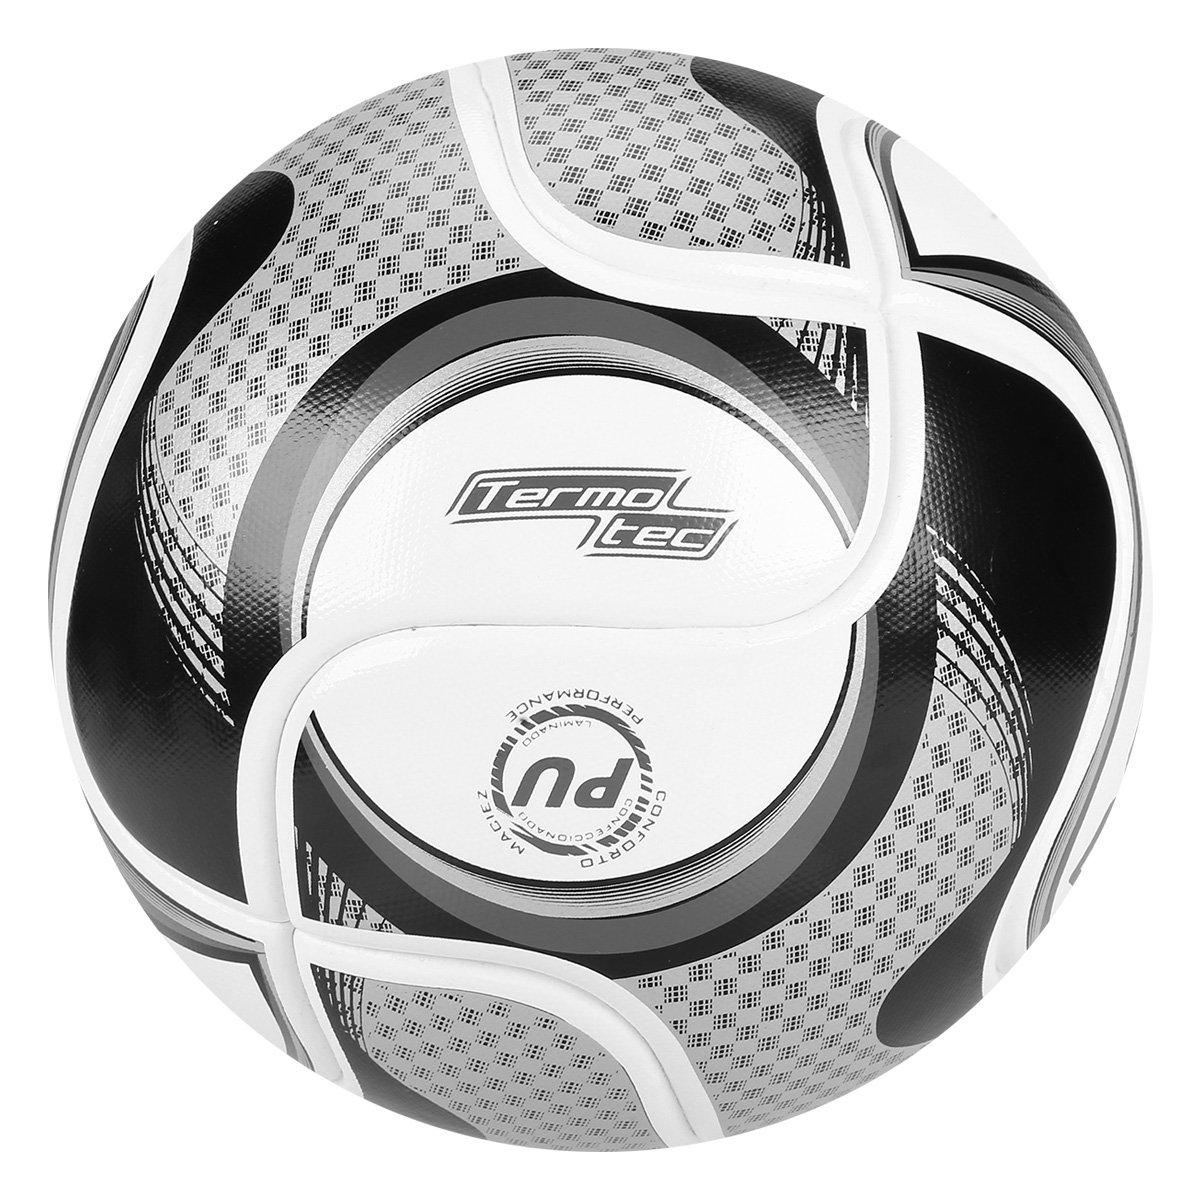 Bola de Futsal Penalty Max 100 All Black - Edição Limitada - Branco ... d6db477397e7a